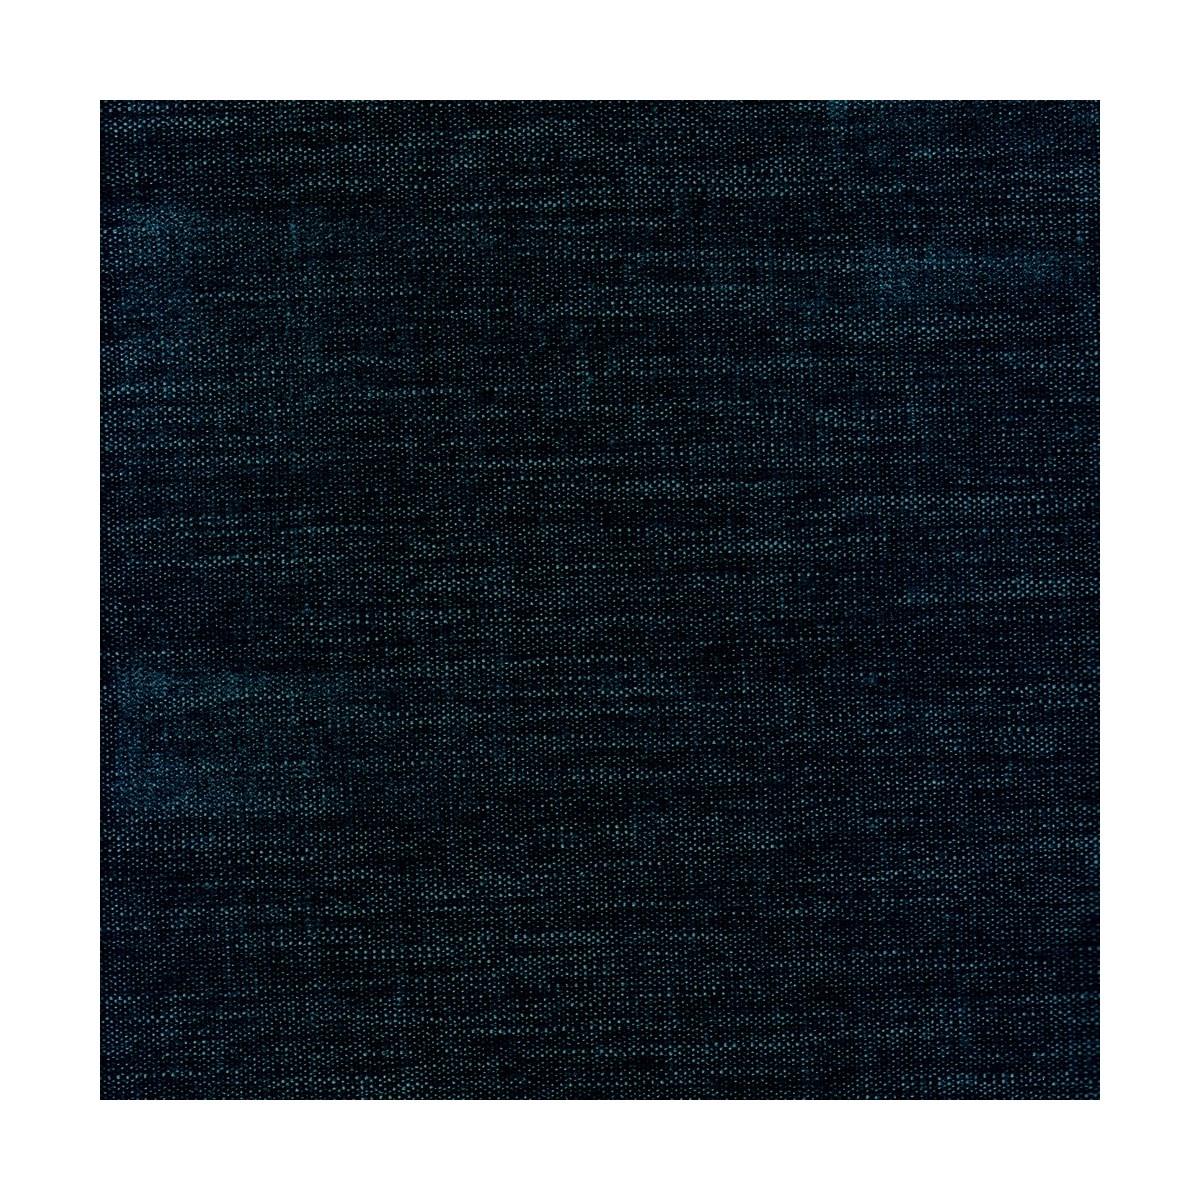 Karvina * - Denim  - Fabric By the Yard